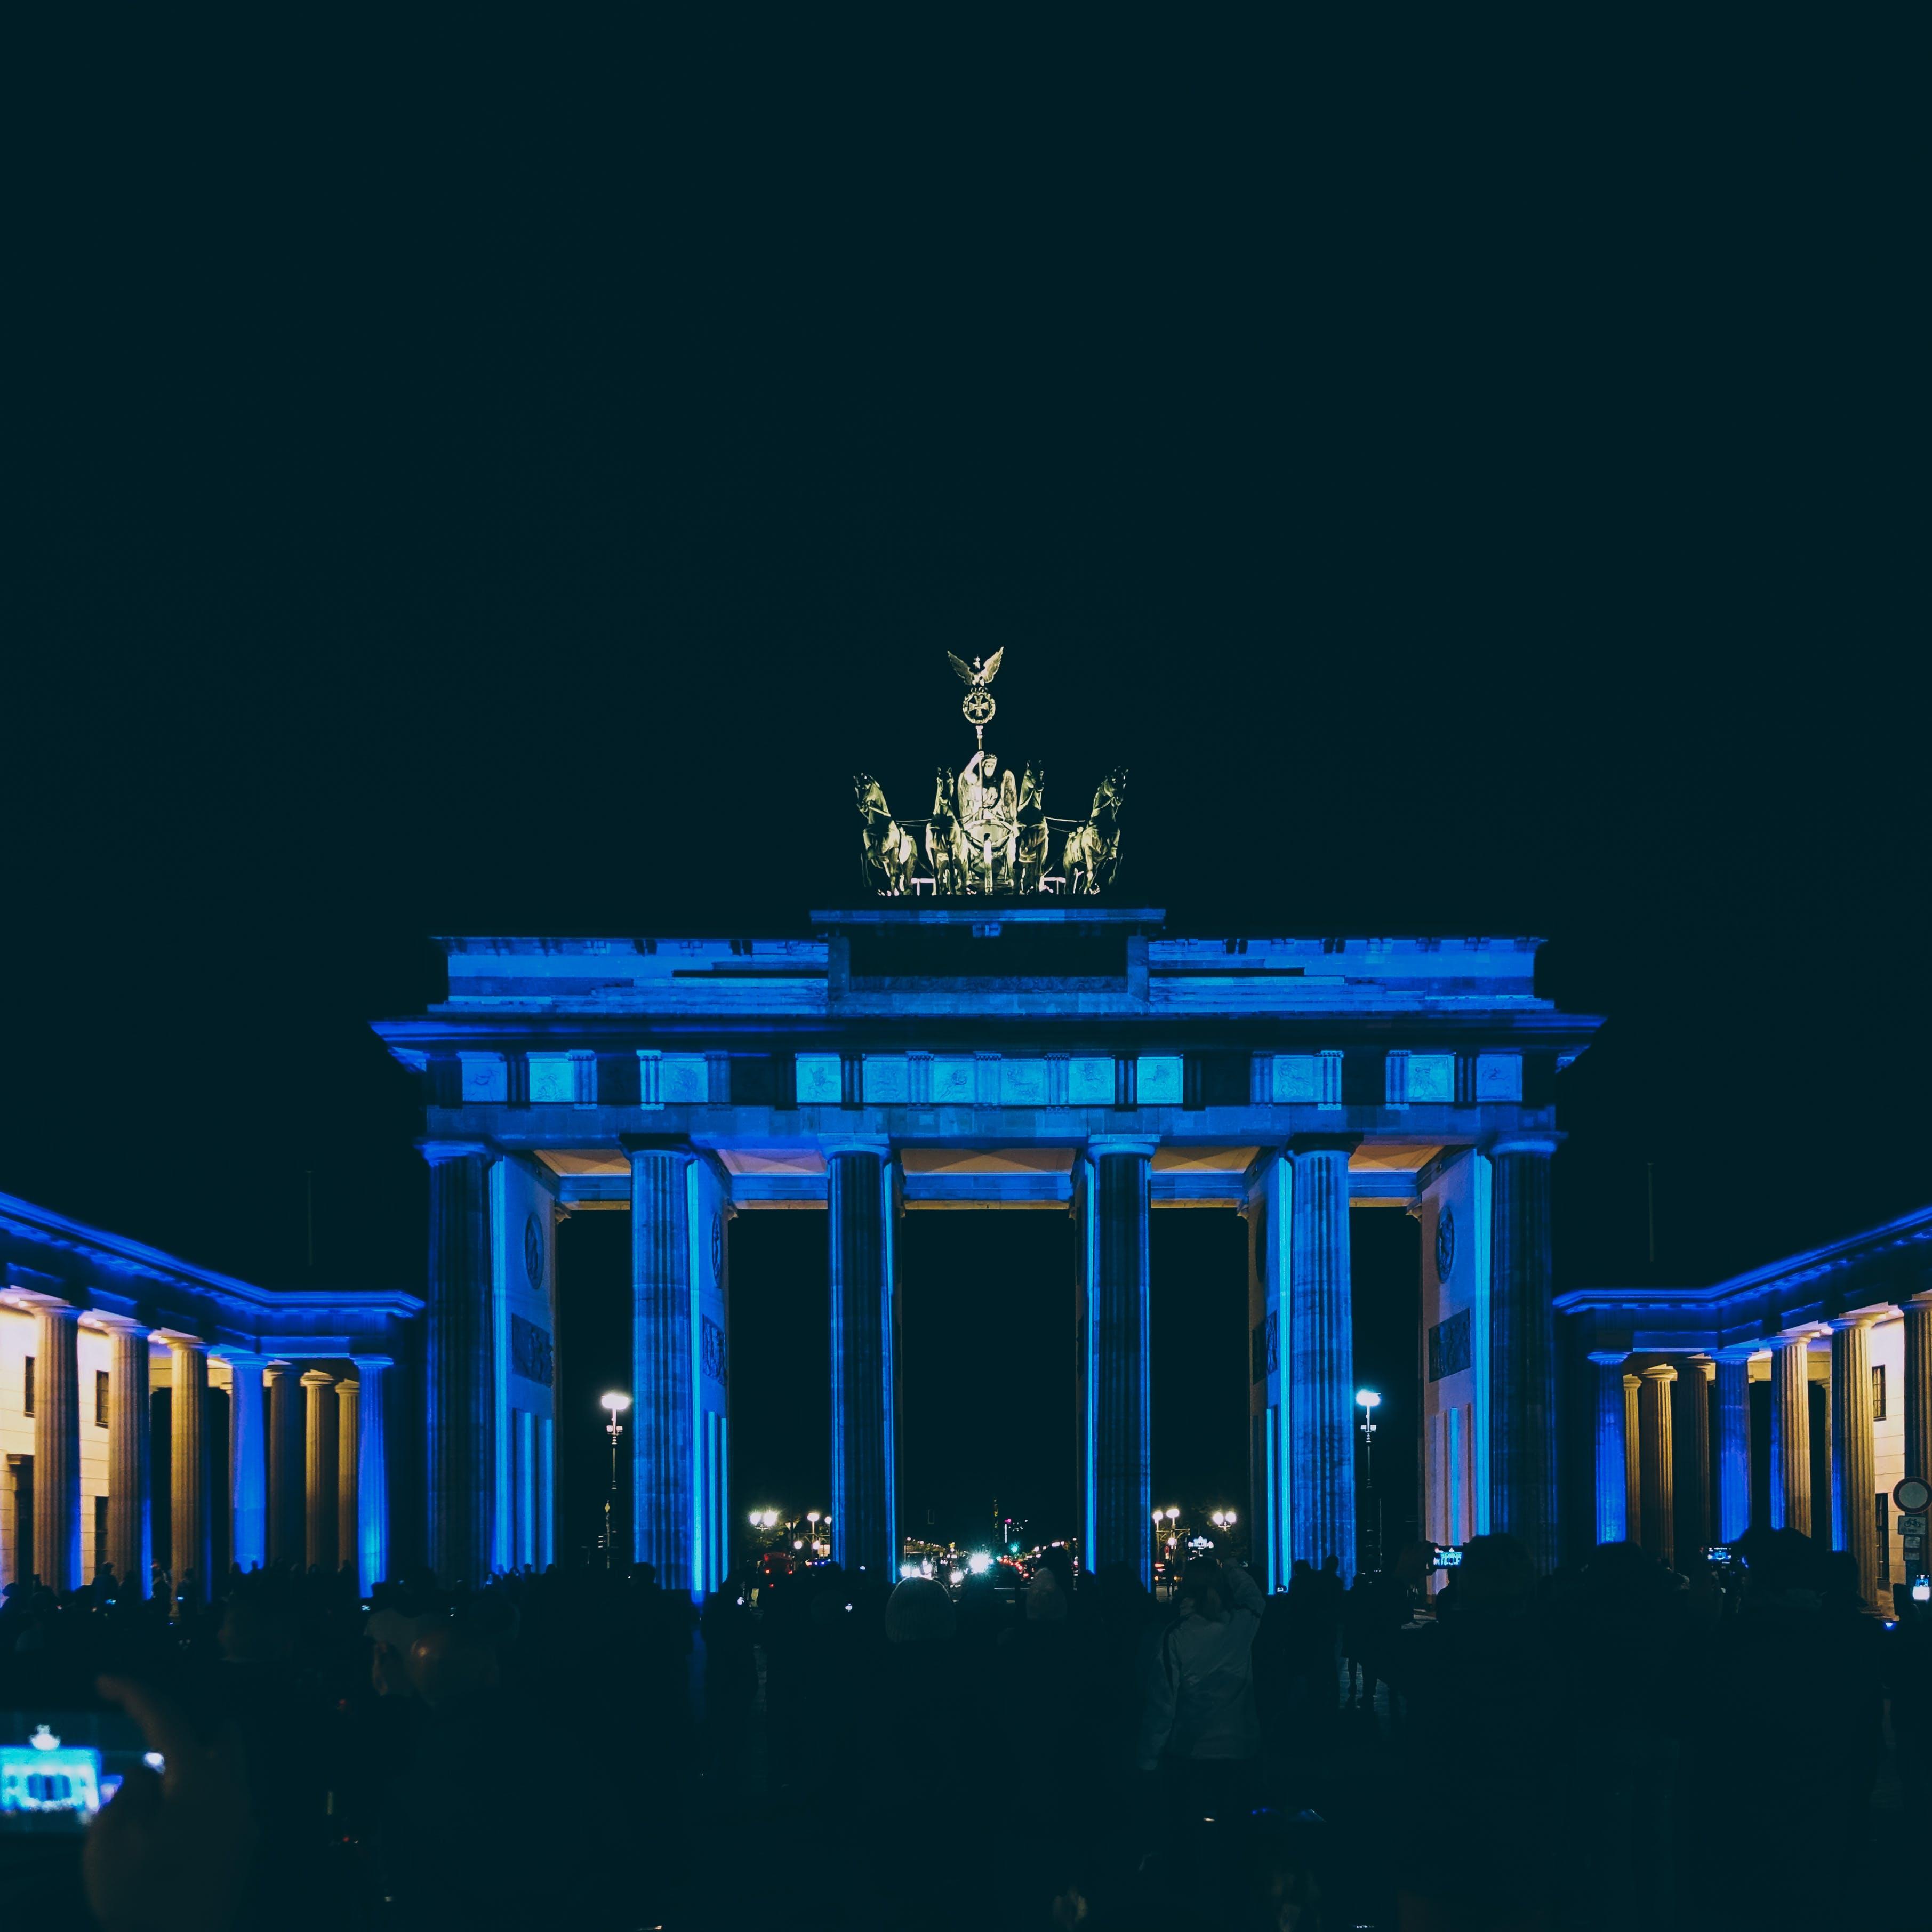 Free stock photo of architecture, building, columns, dark